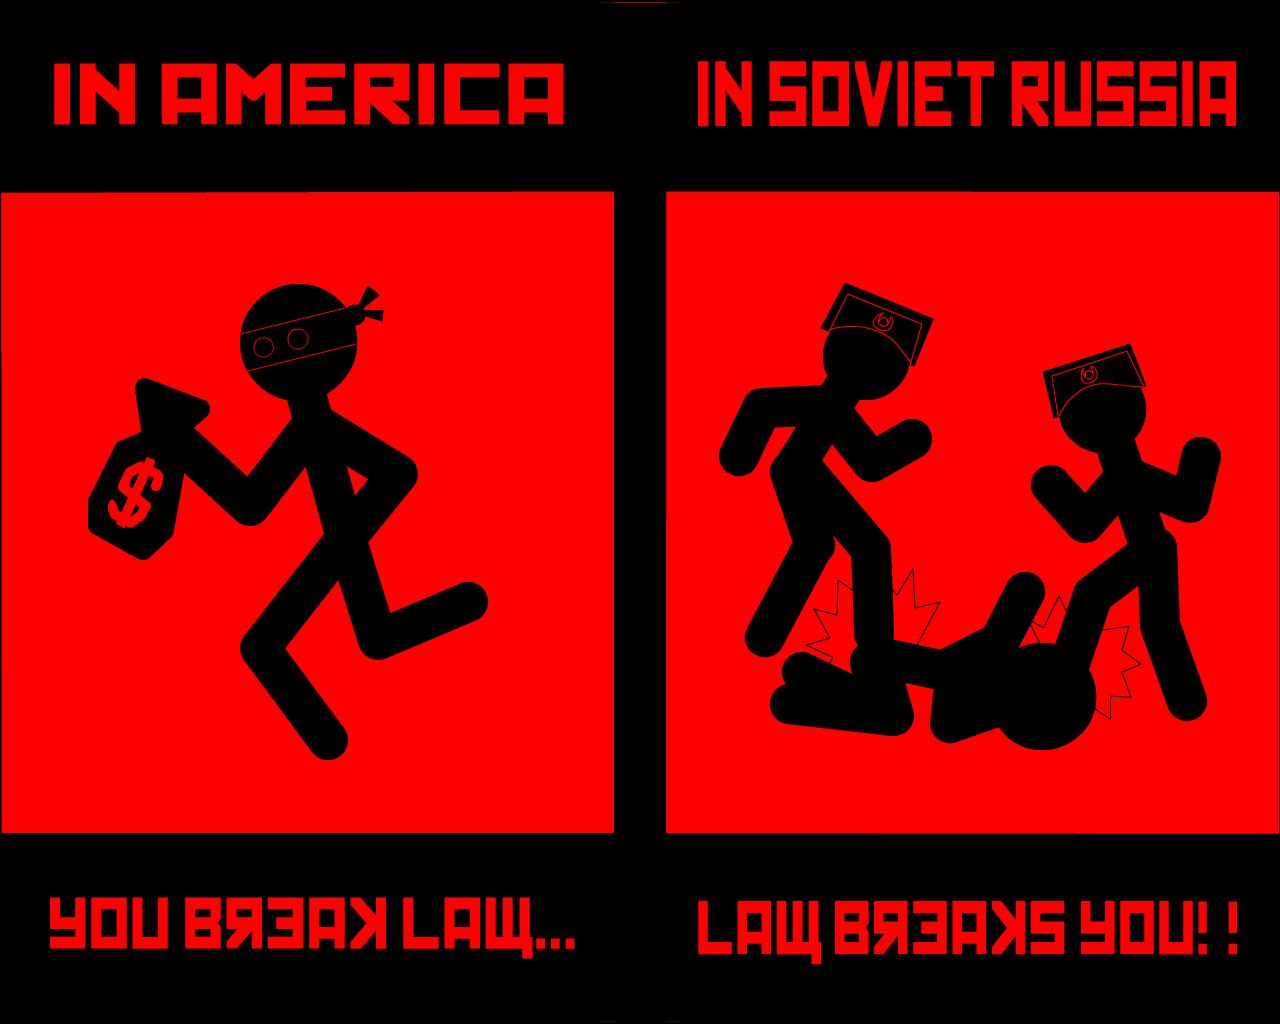 In Soviet Russia... by RainbowJerk